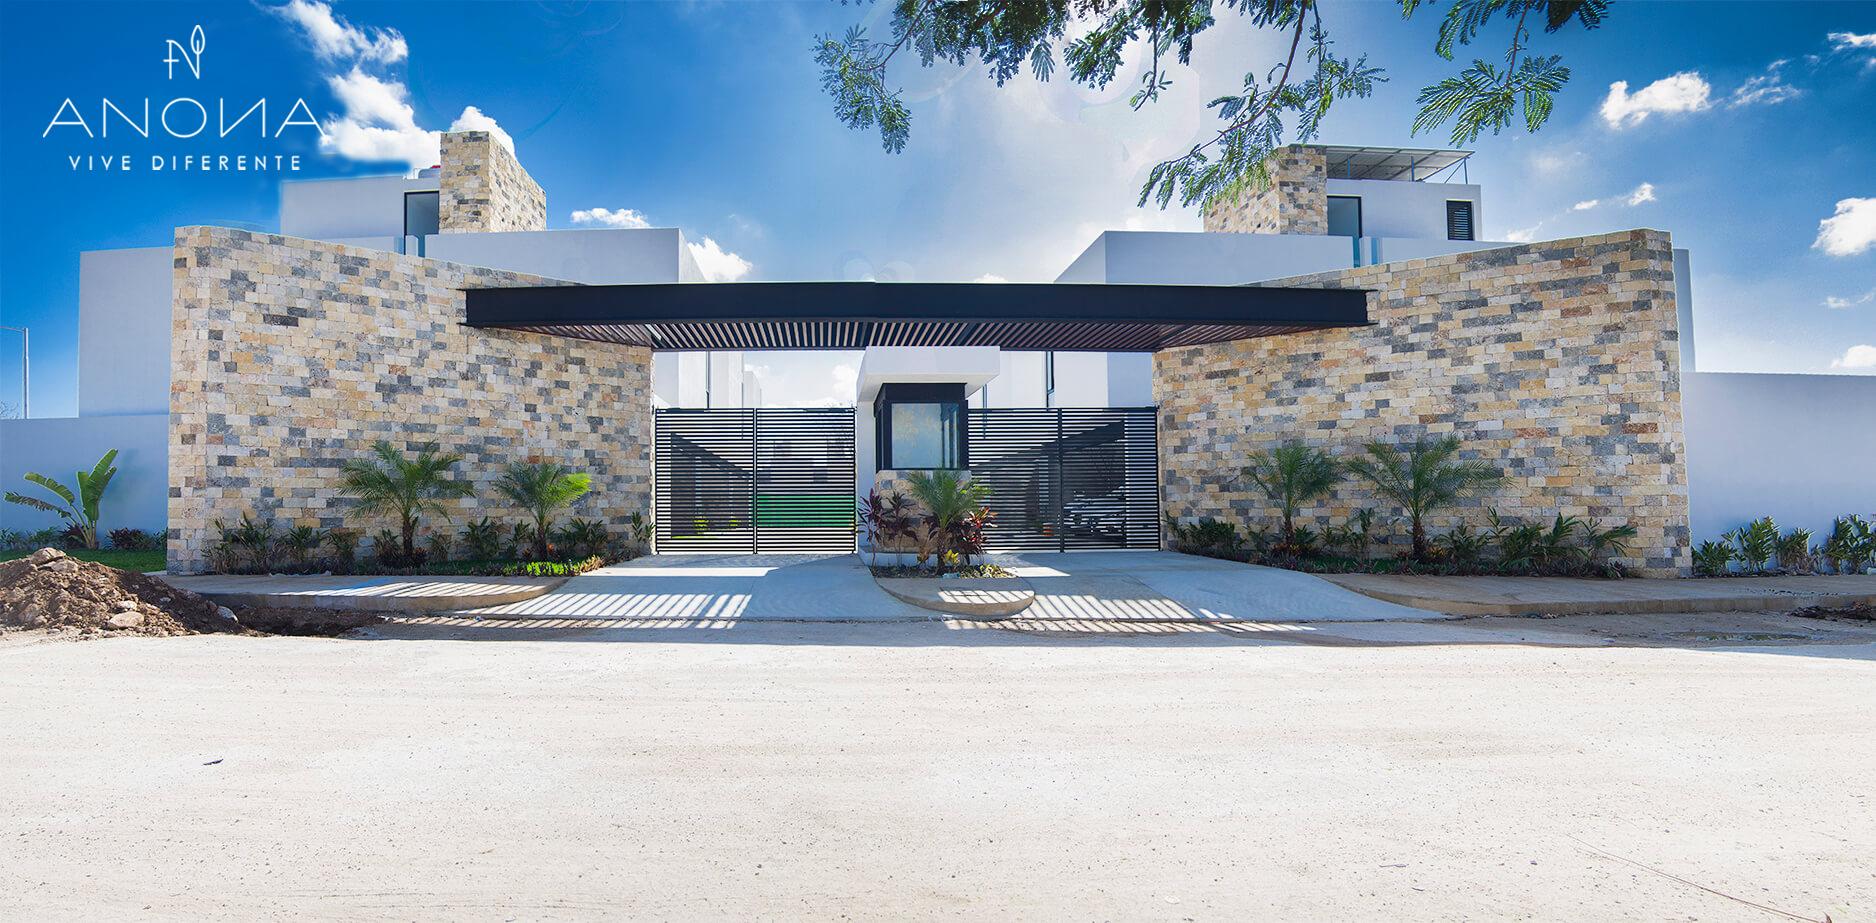 Casa en Privada Anona en Temozón Norte en Mérida Yucatán